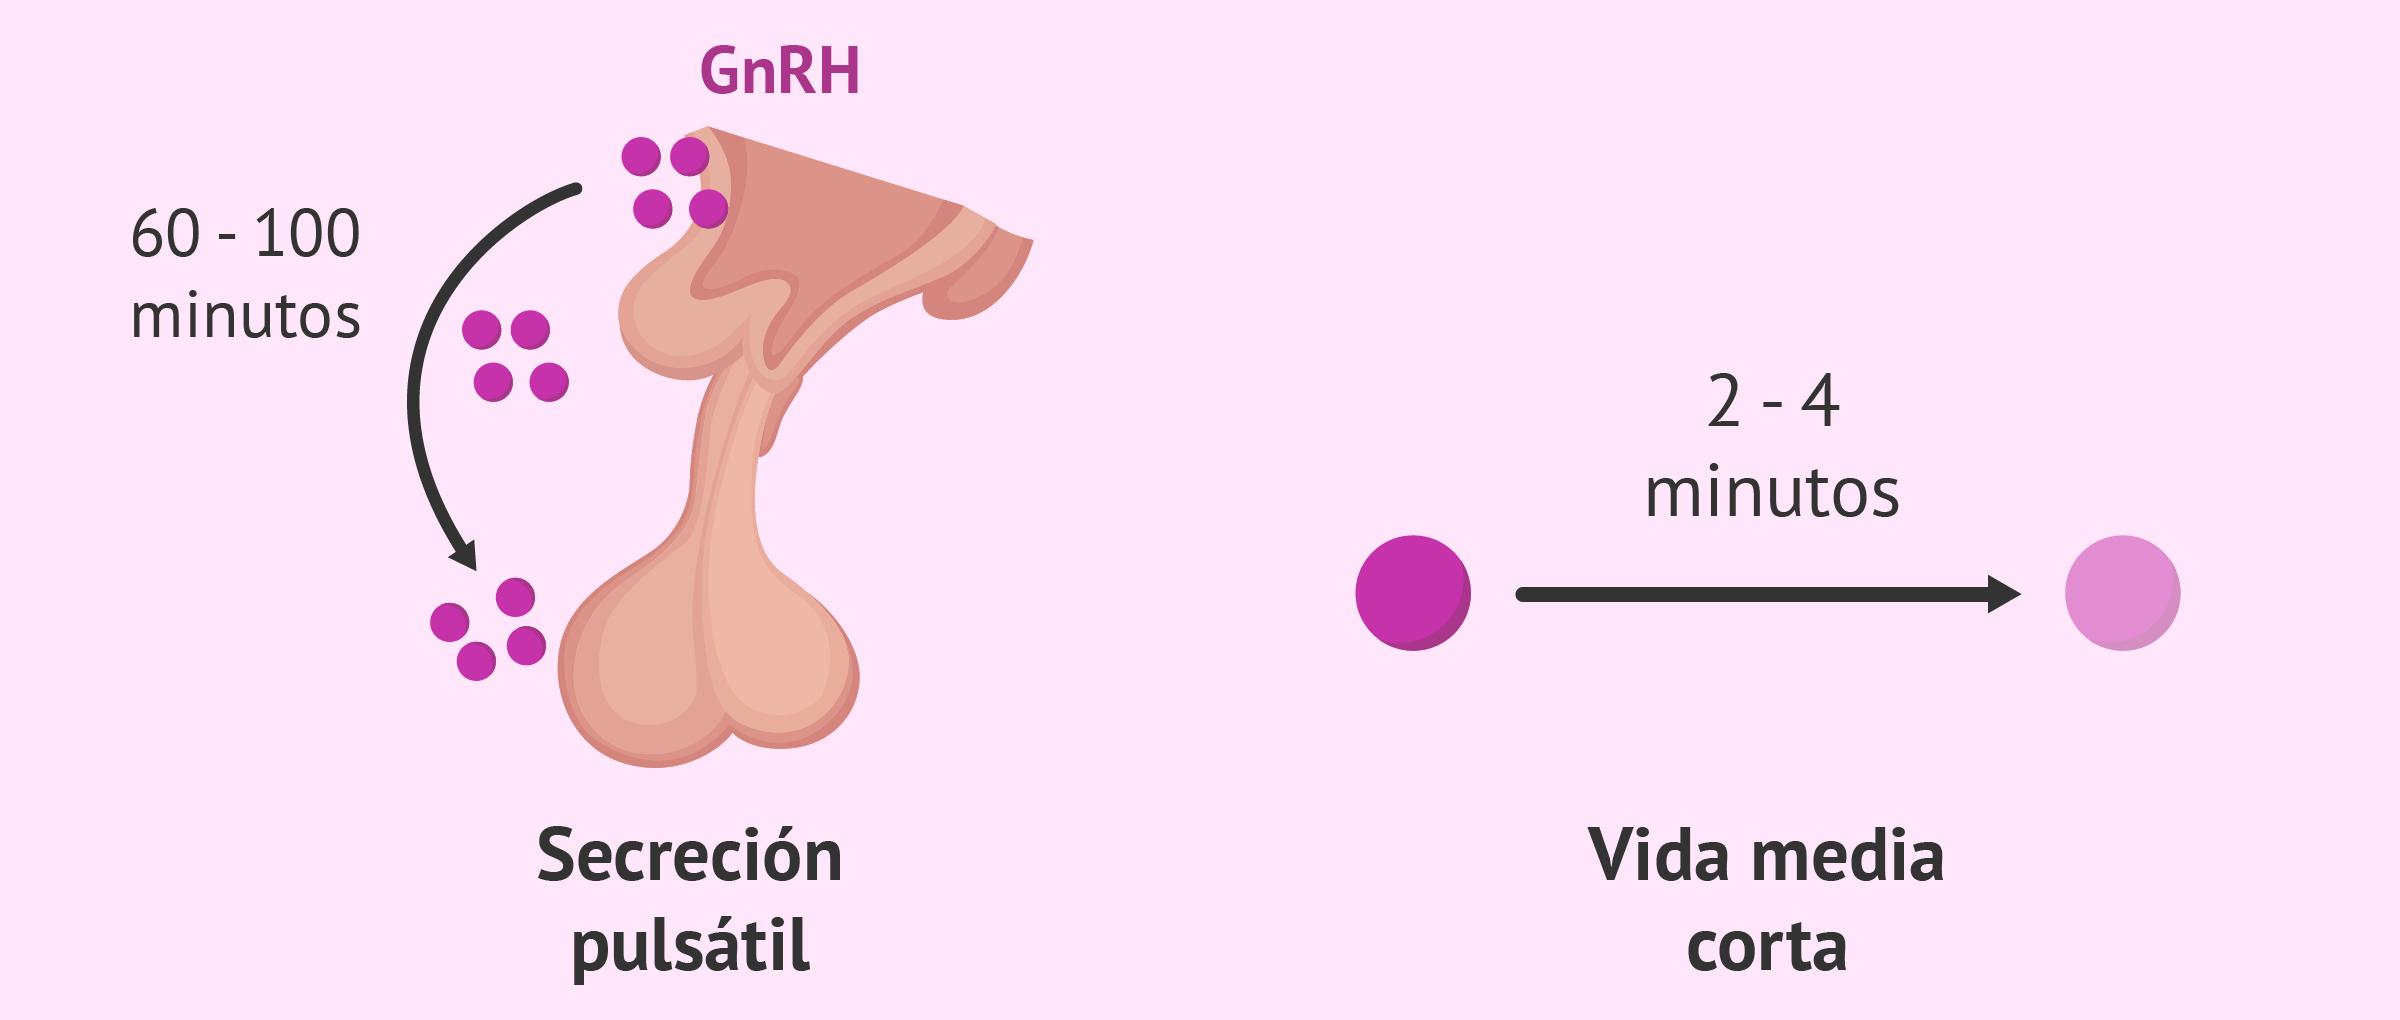 La GnRH